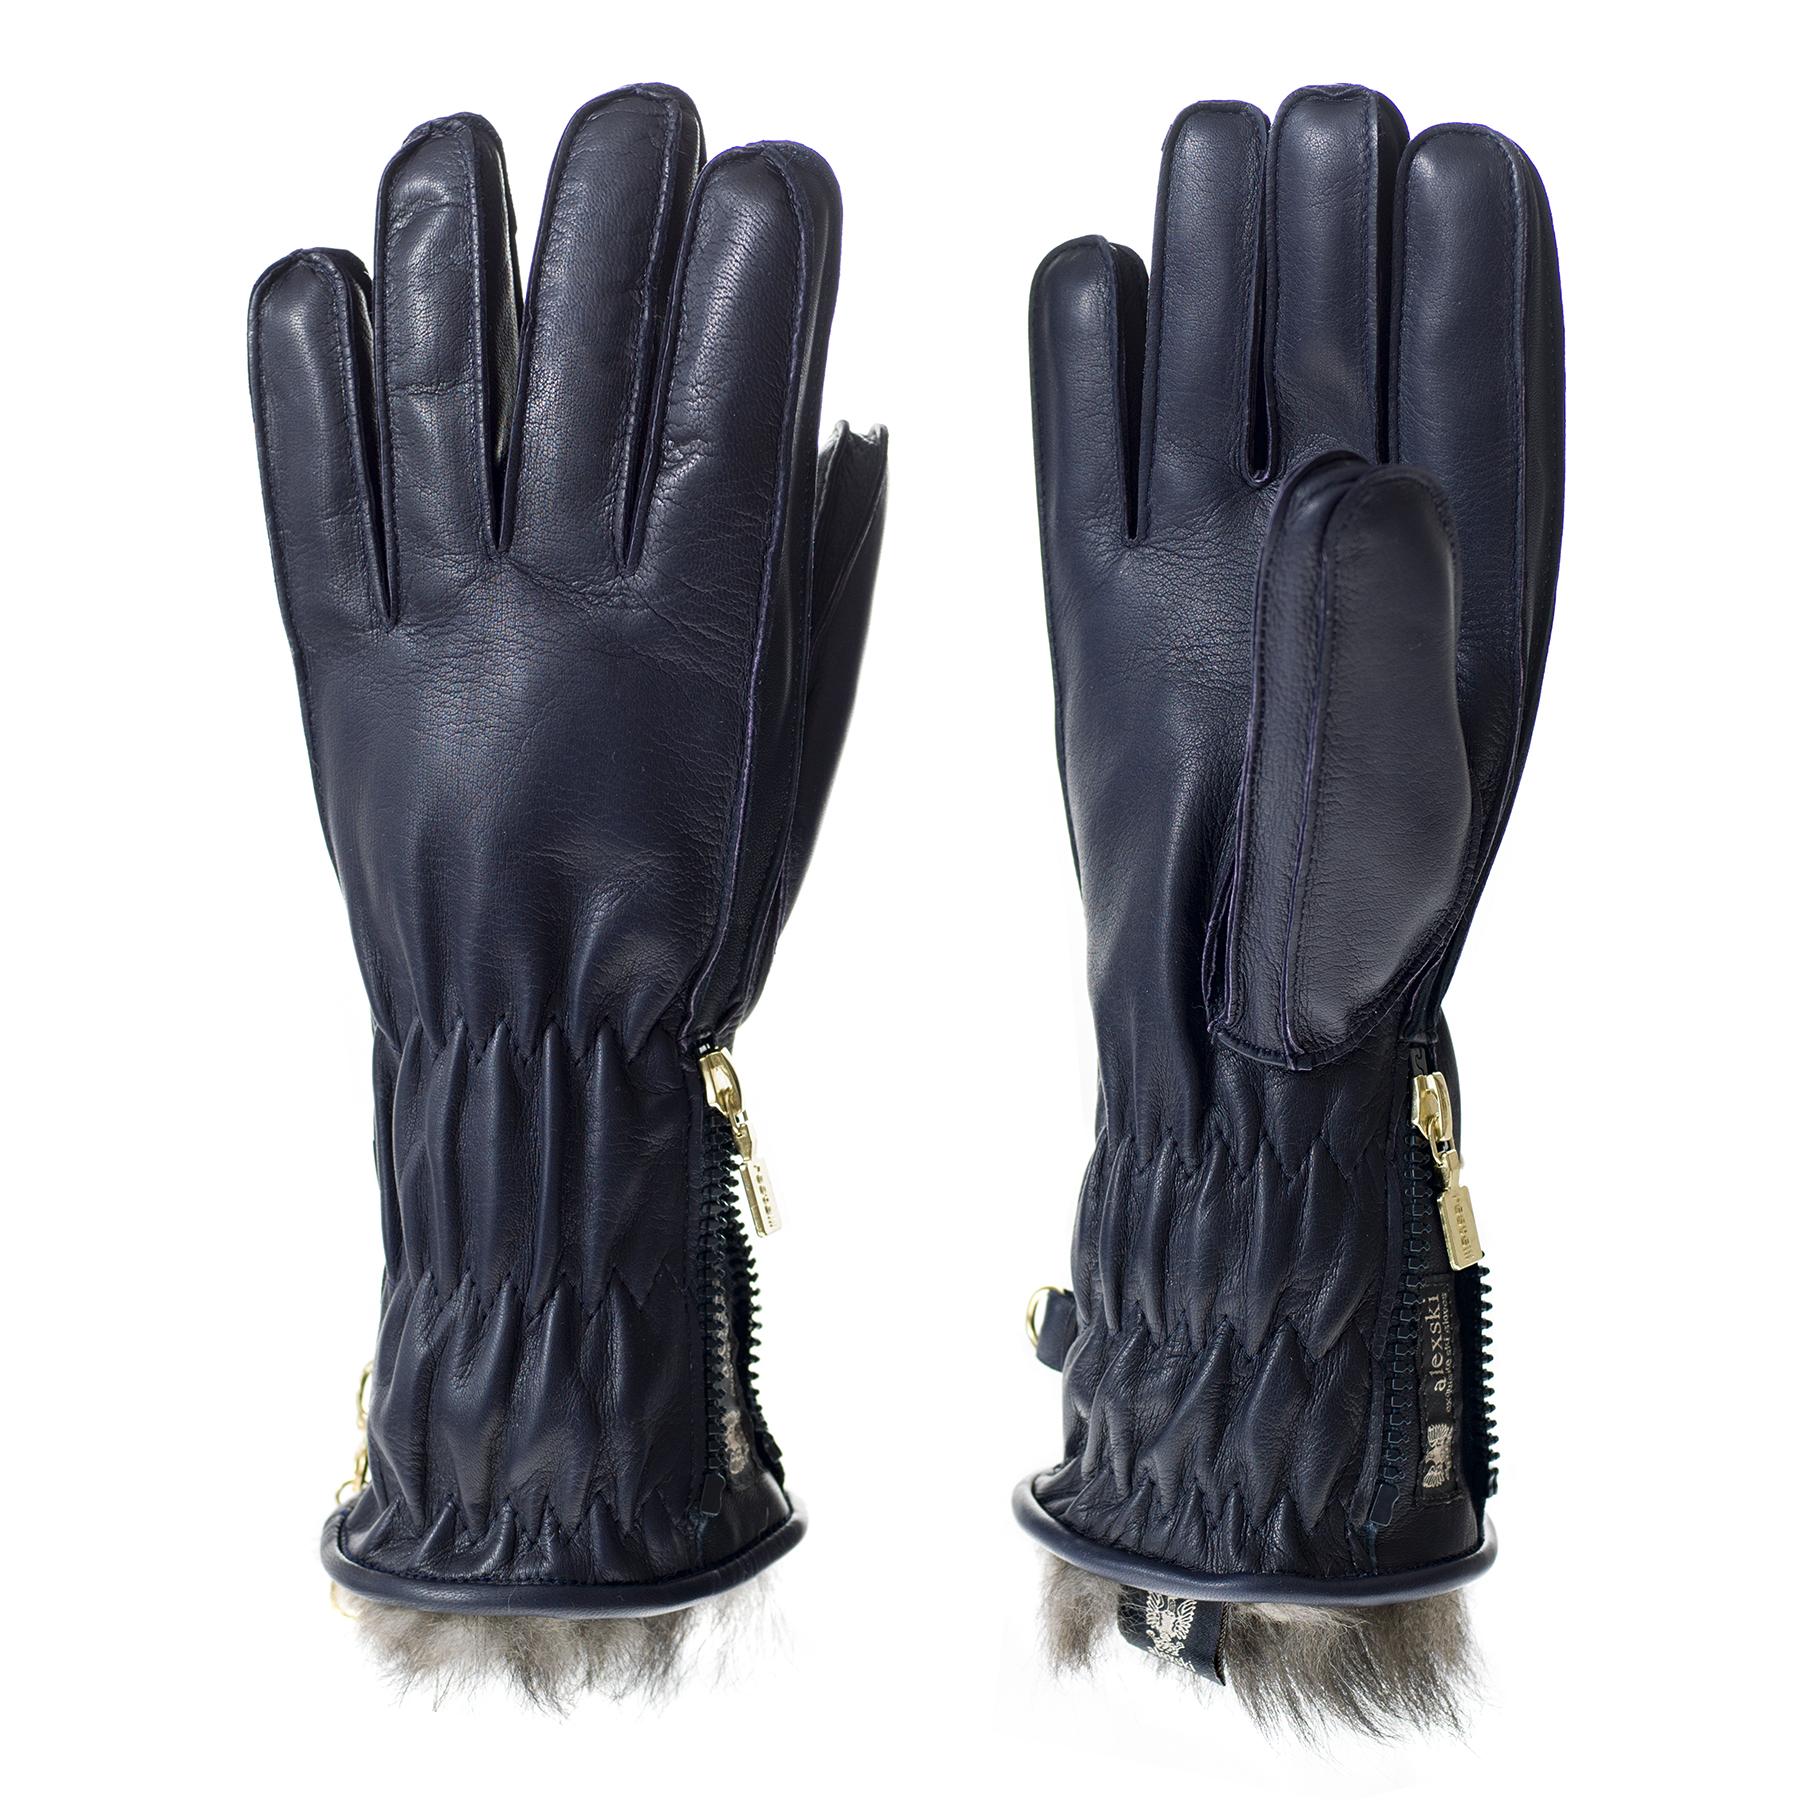 Ladies Navy Leather Ski Glove